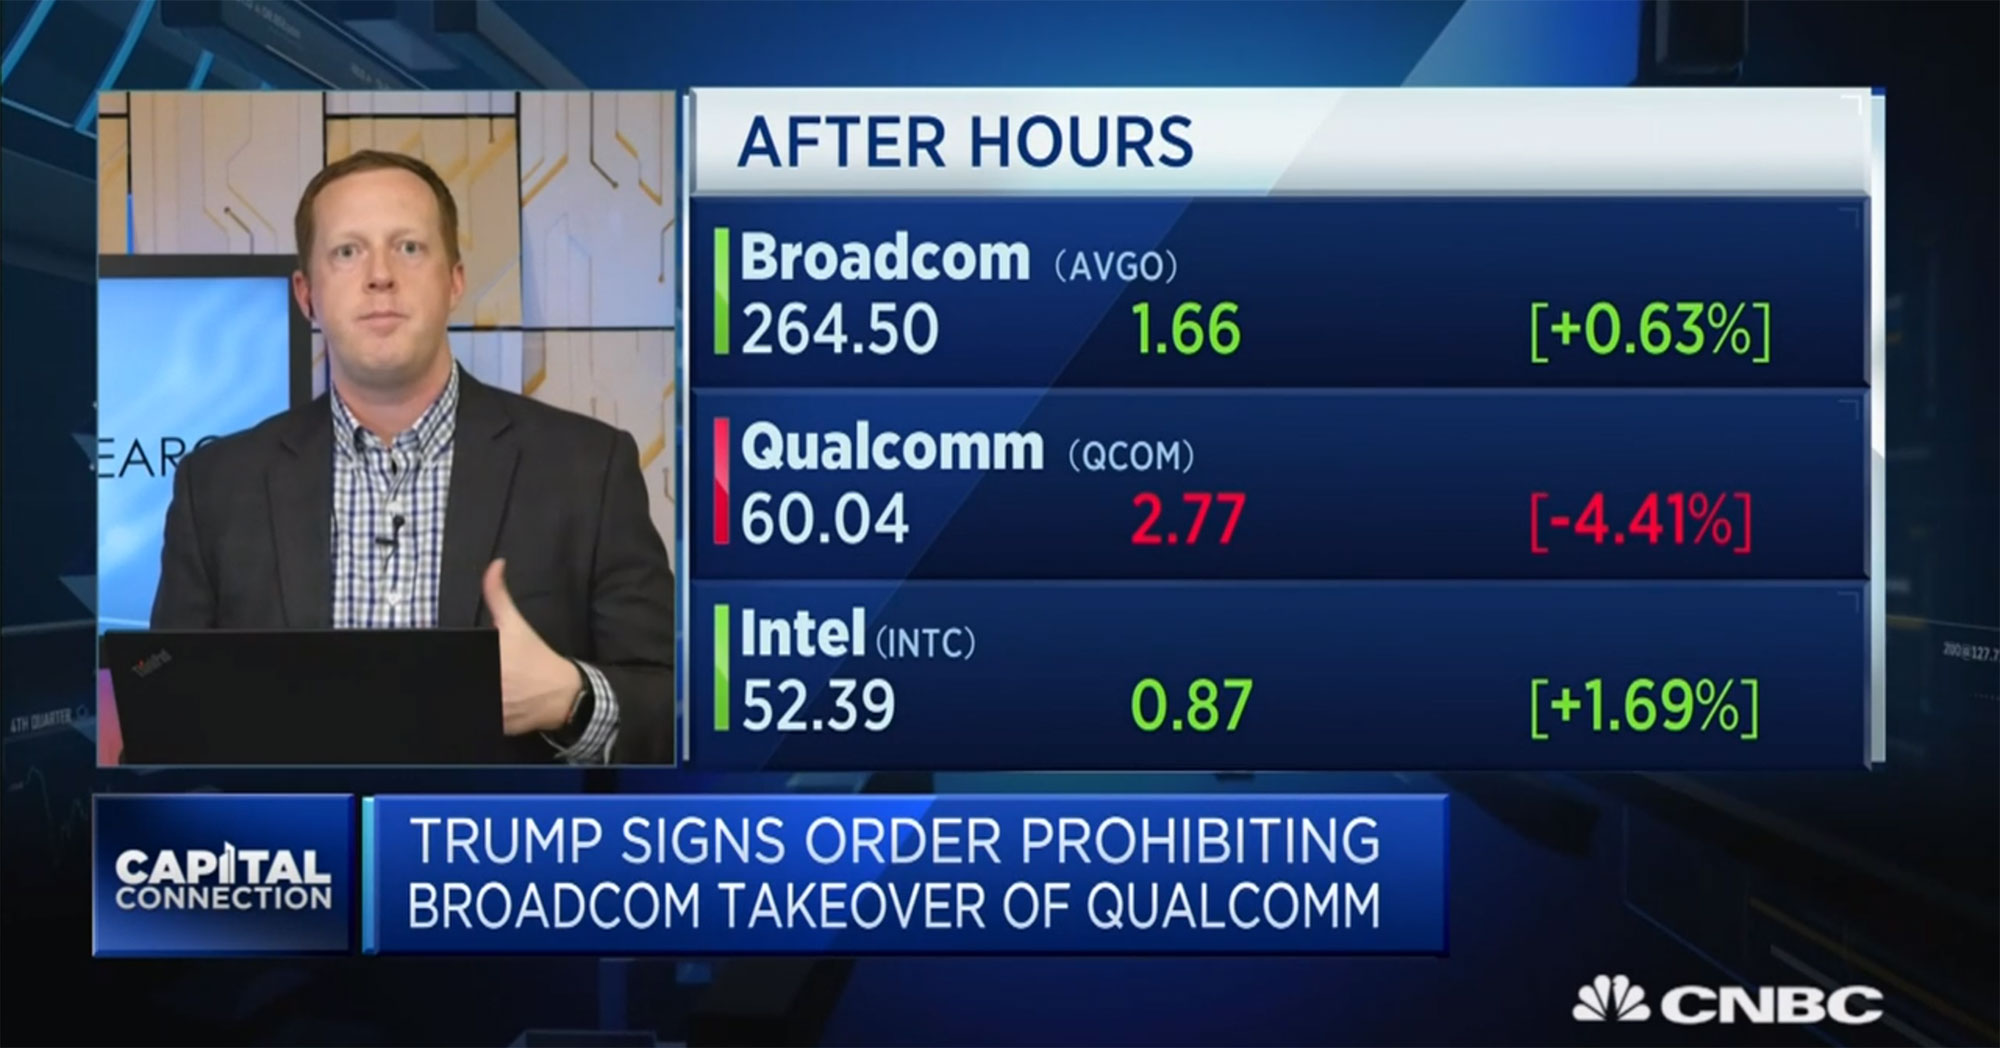 trump blocks broadcom bid for qualcomm - source